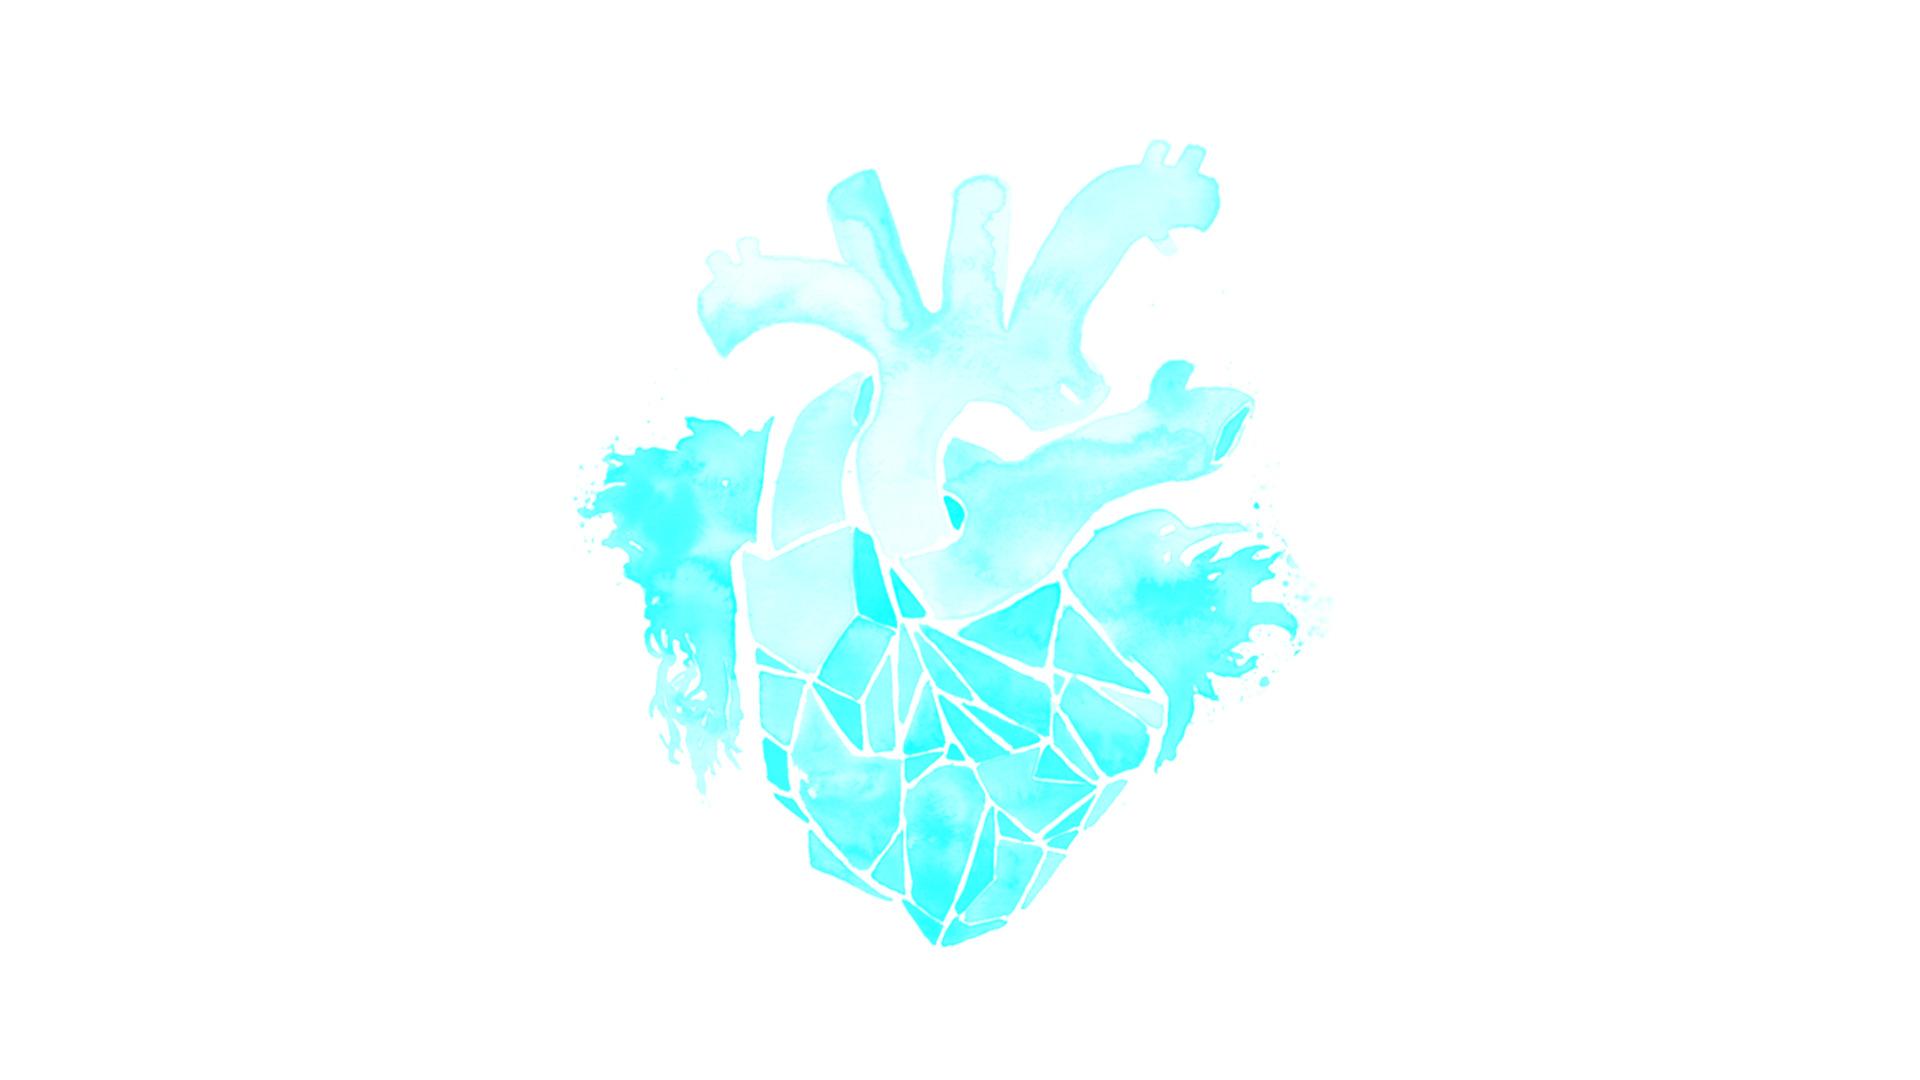 heartbeat-stf.jpg